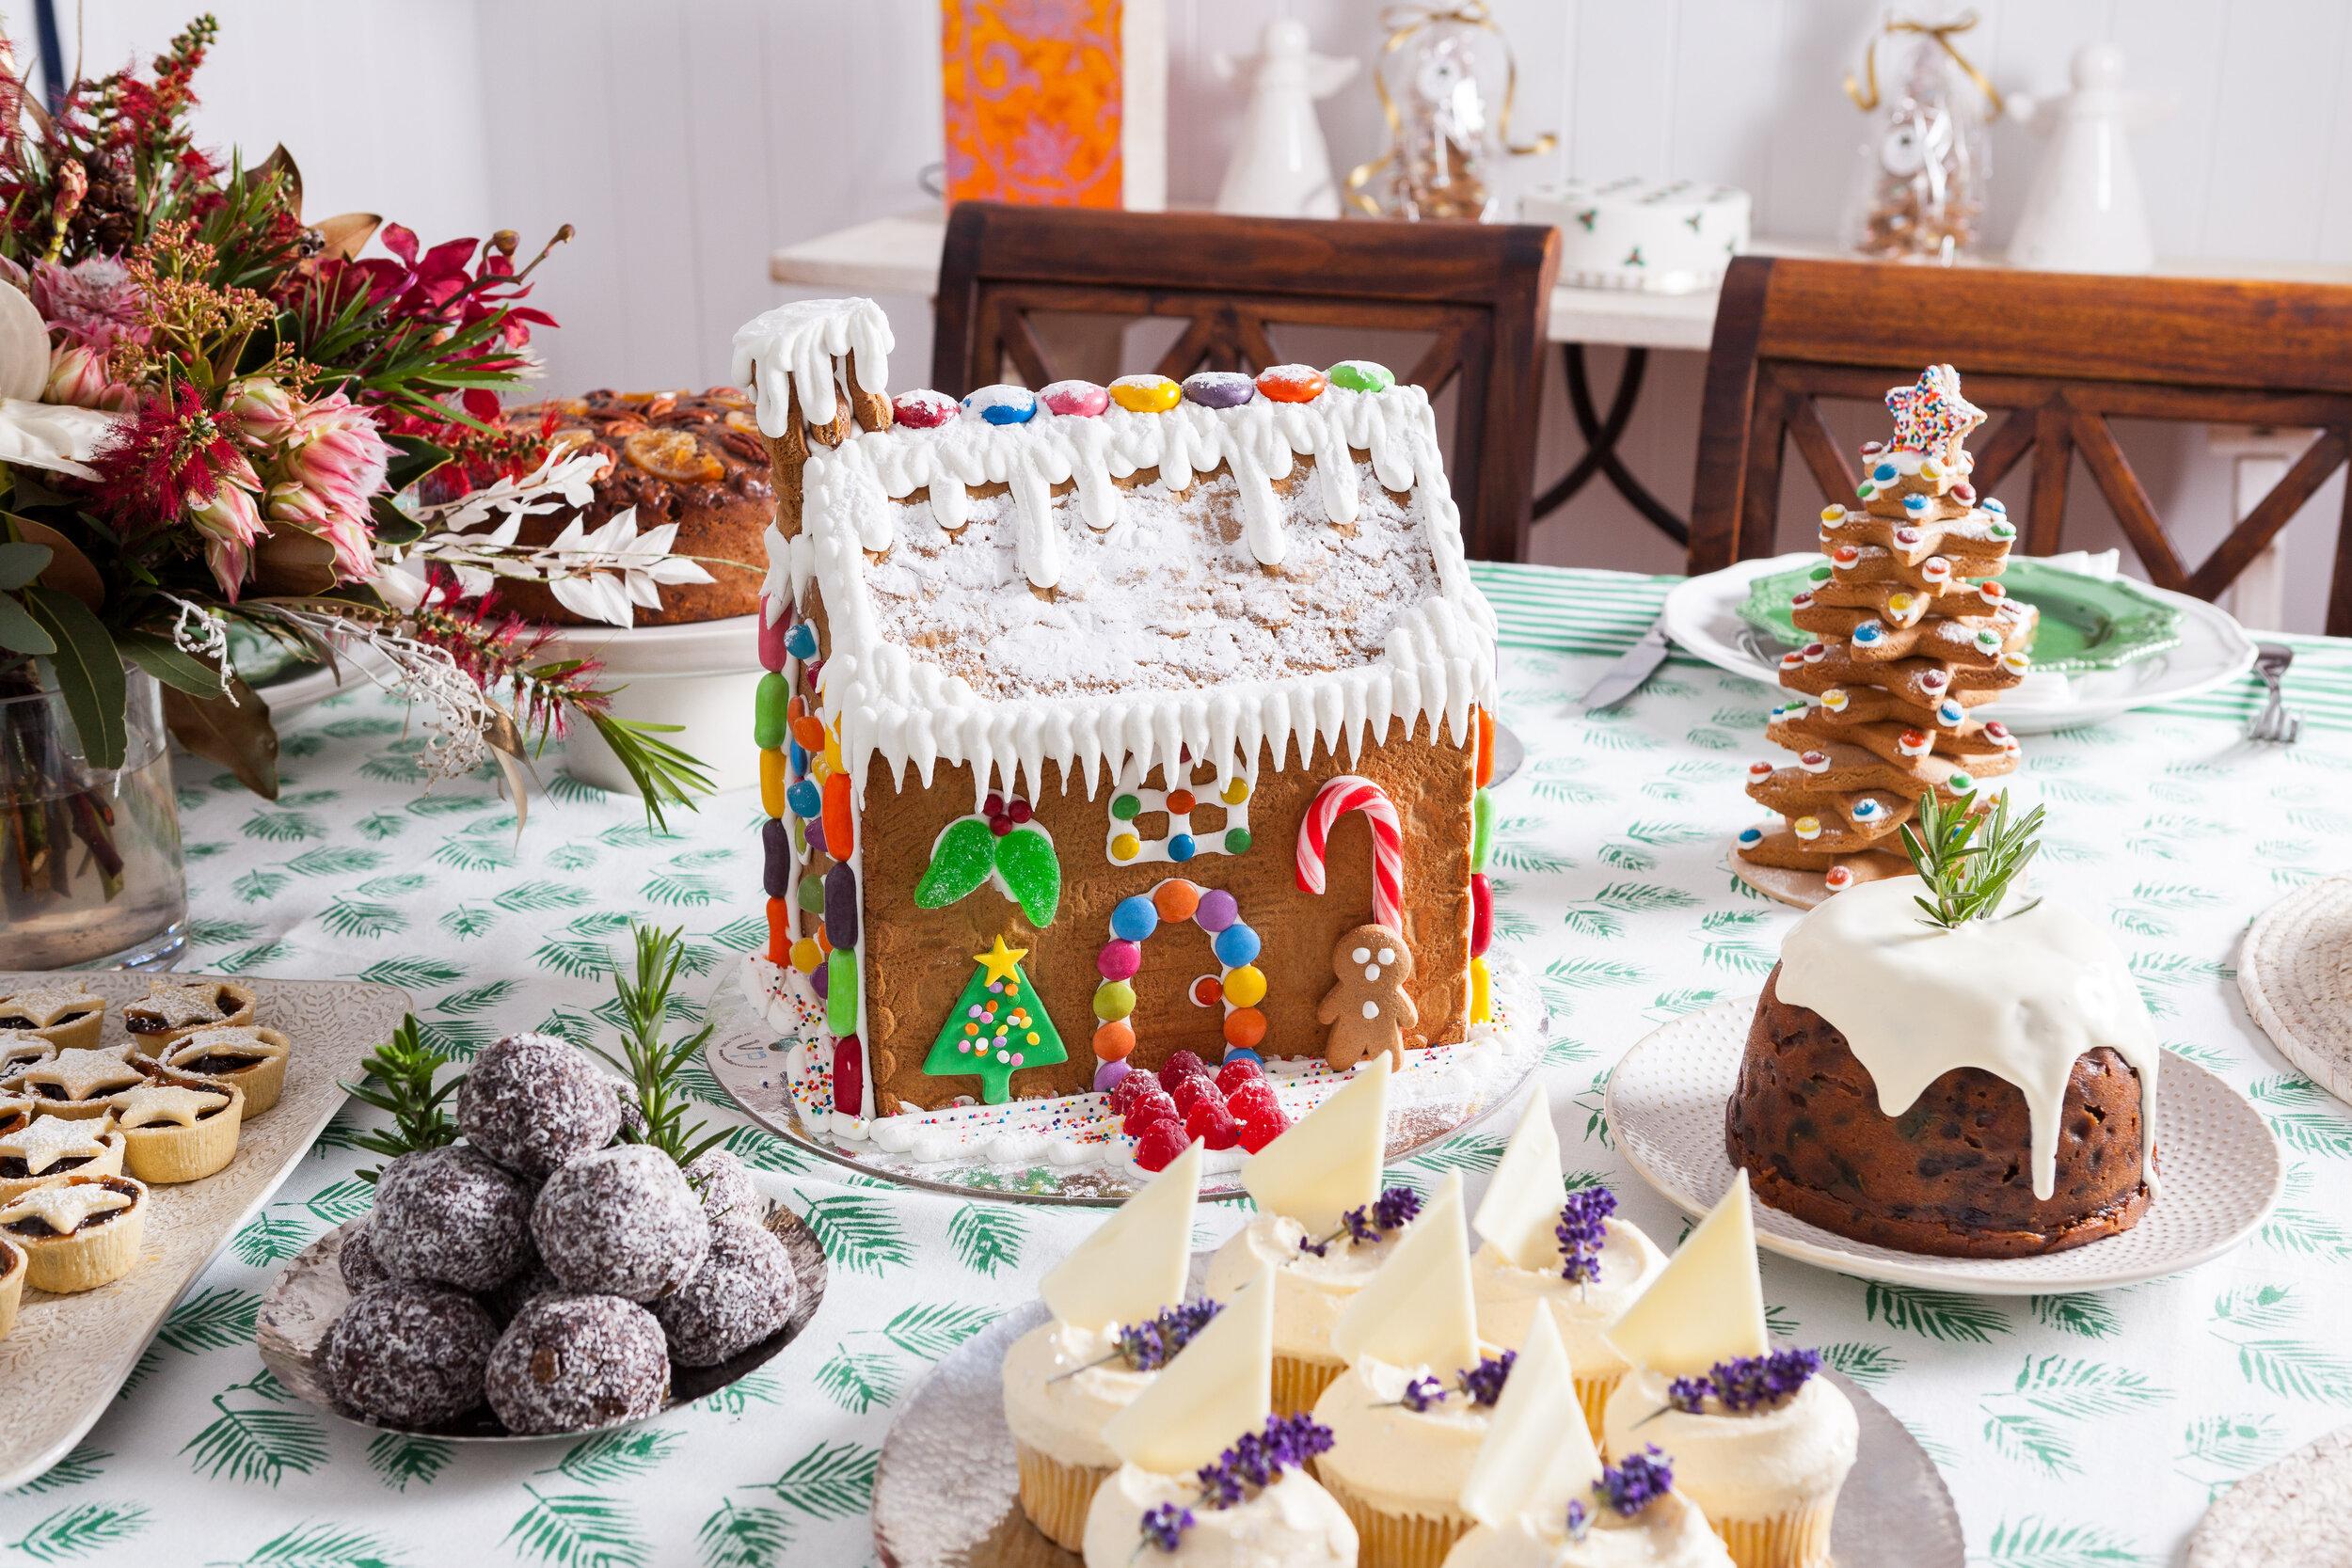 Vanillapodspecialtycakes_Christmas2019-90.jpg